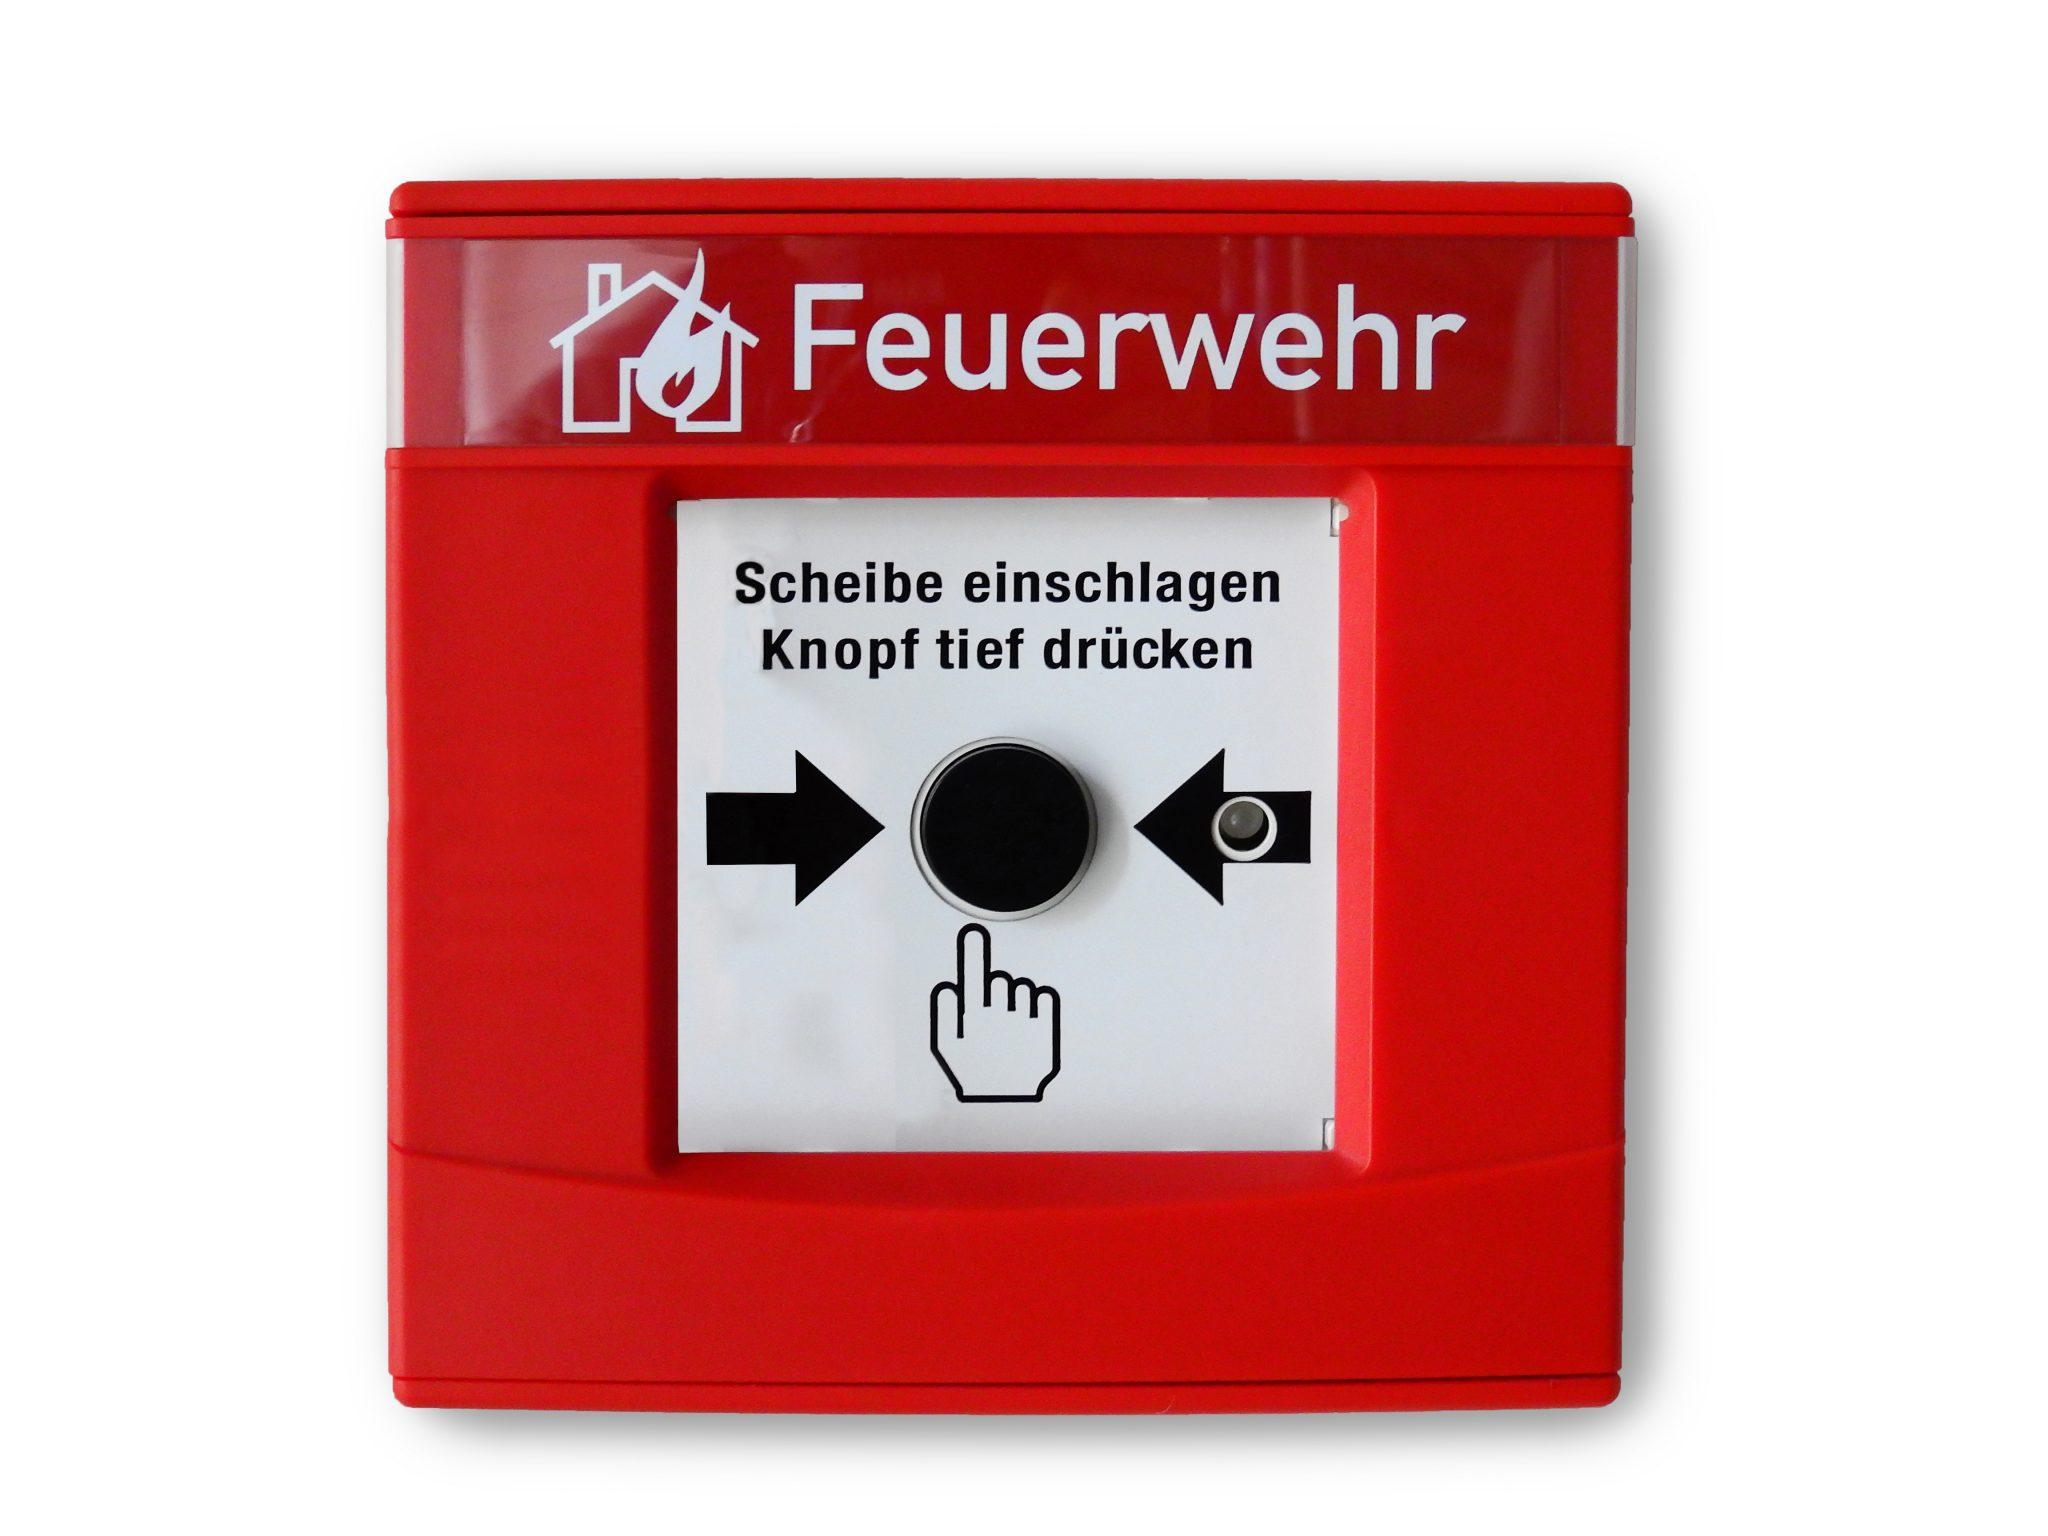 hand-detector-2144289